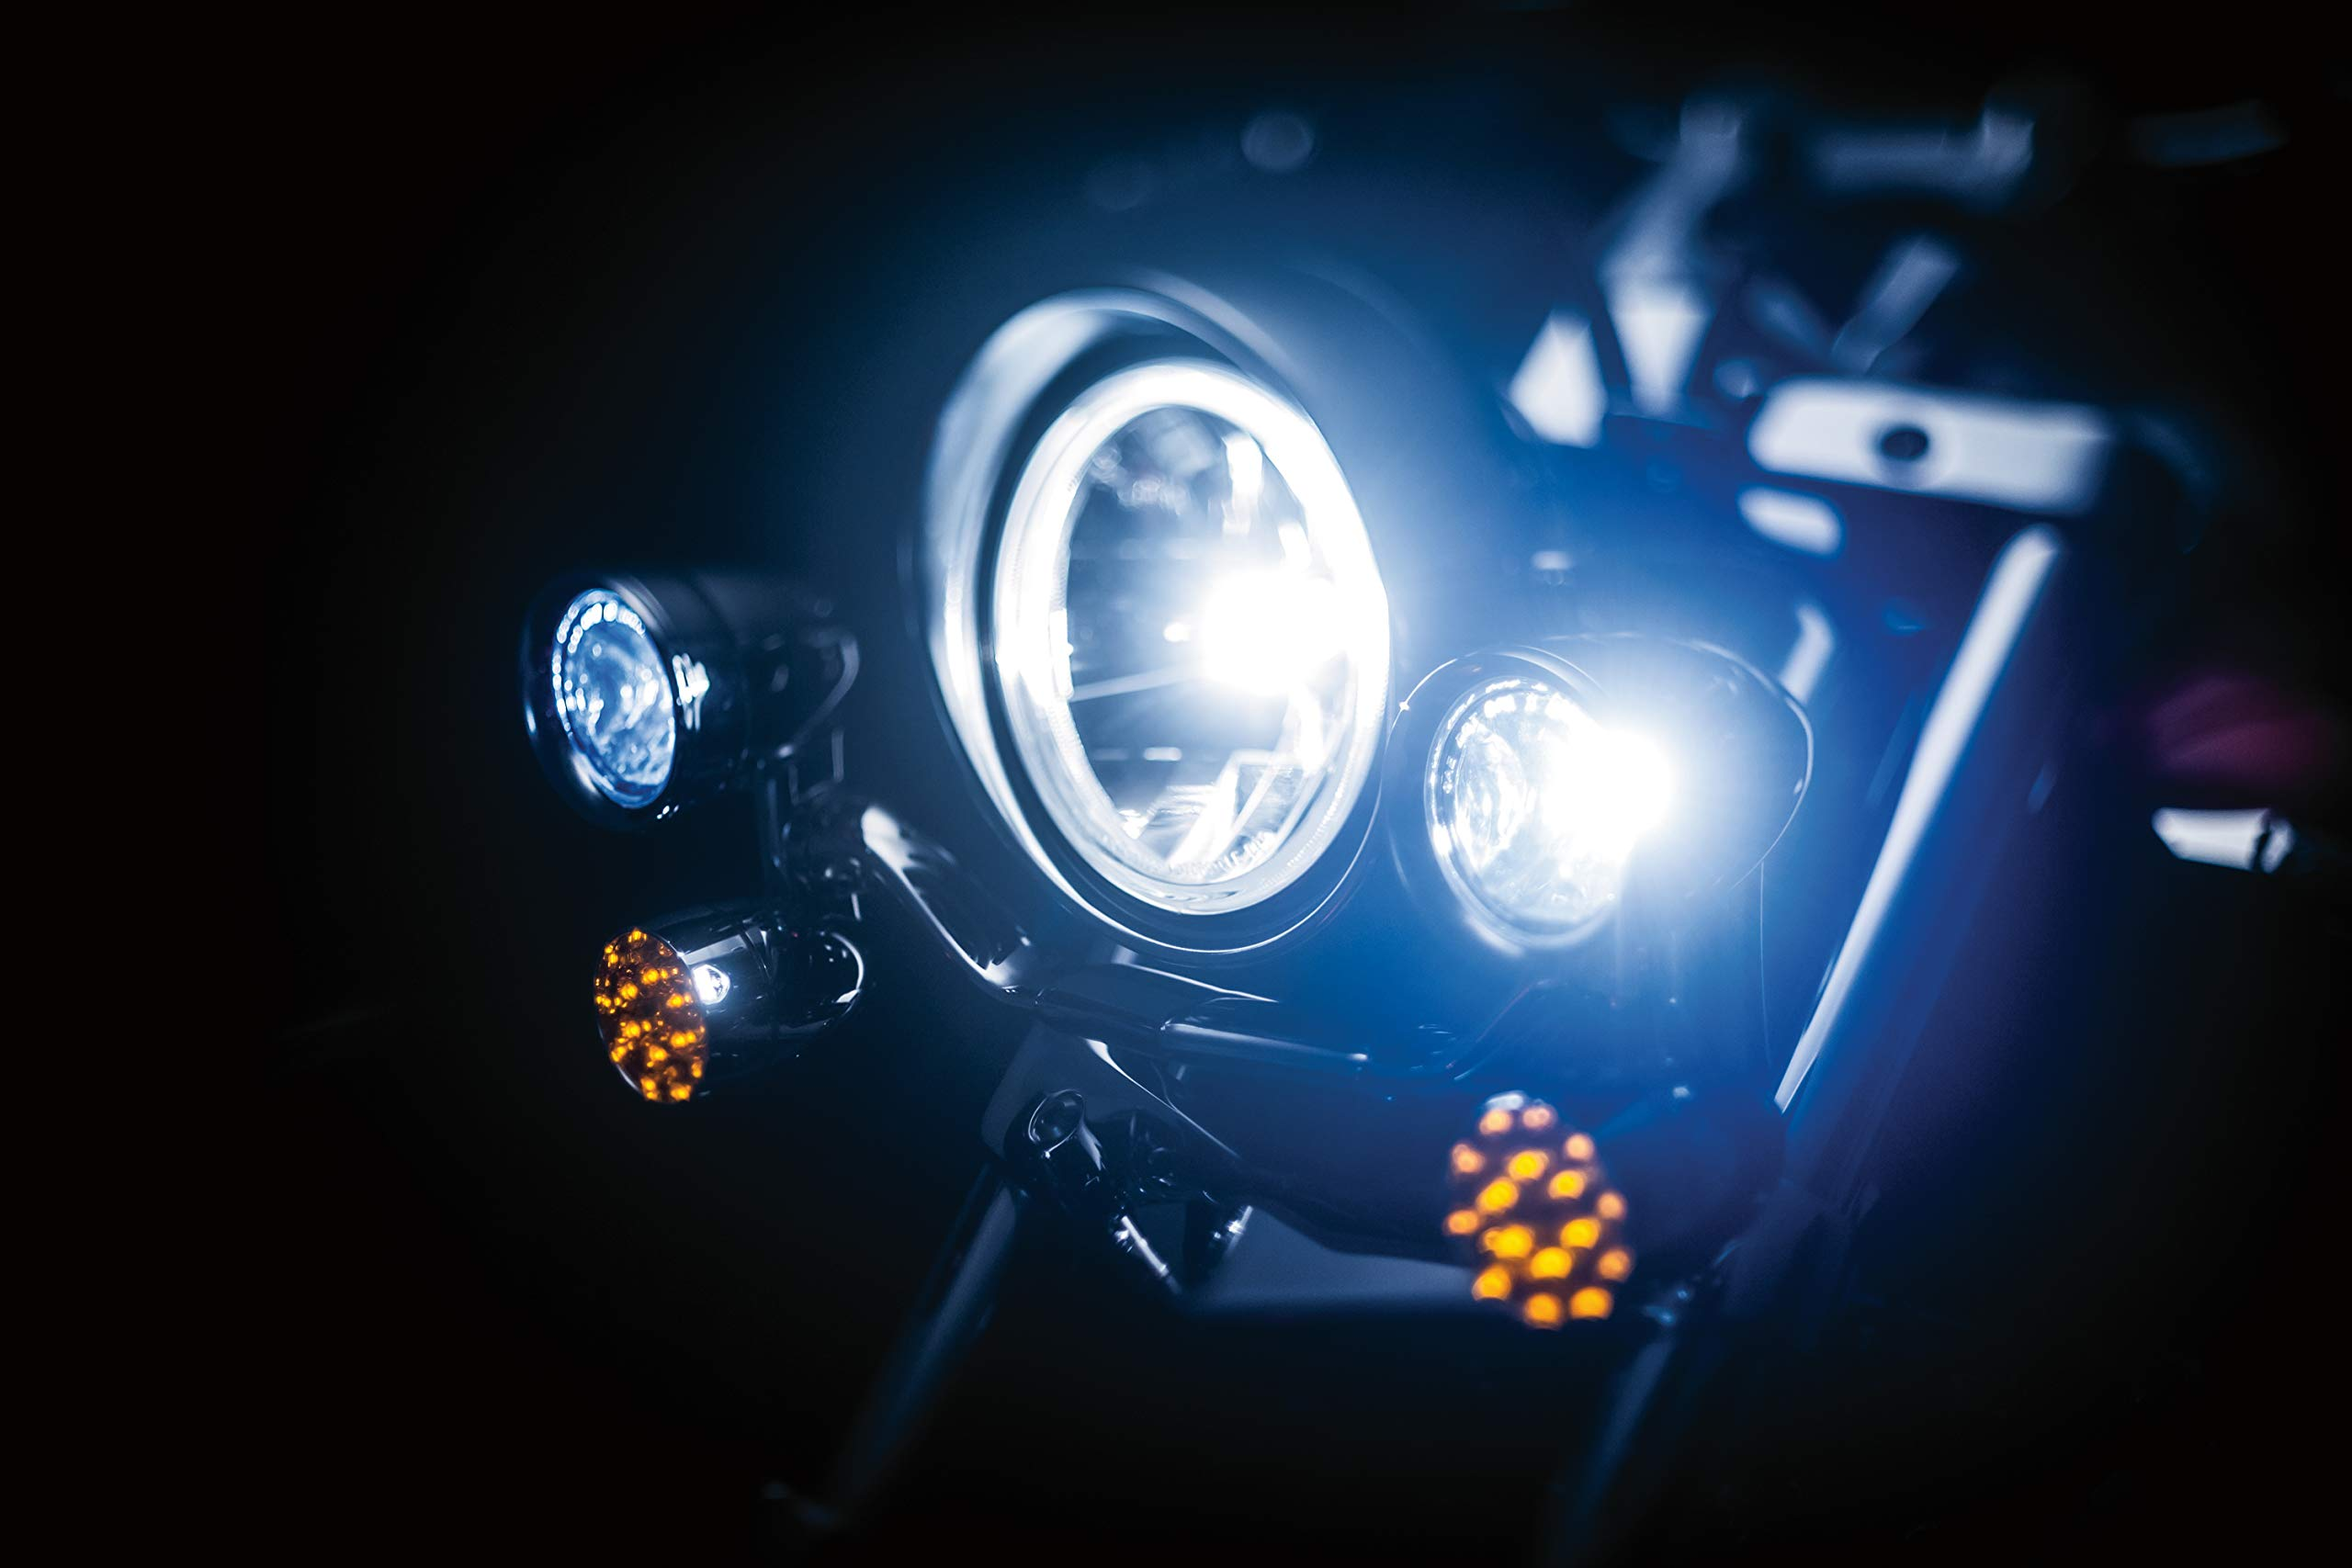 Kuryakyn 5001 Motorcycle Lighting Accessory: Constellation Driving Light Bar with Turn Signal/Blinker Lights, Chrome by Kuryakyn